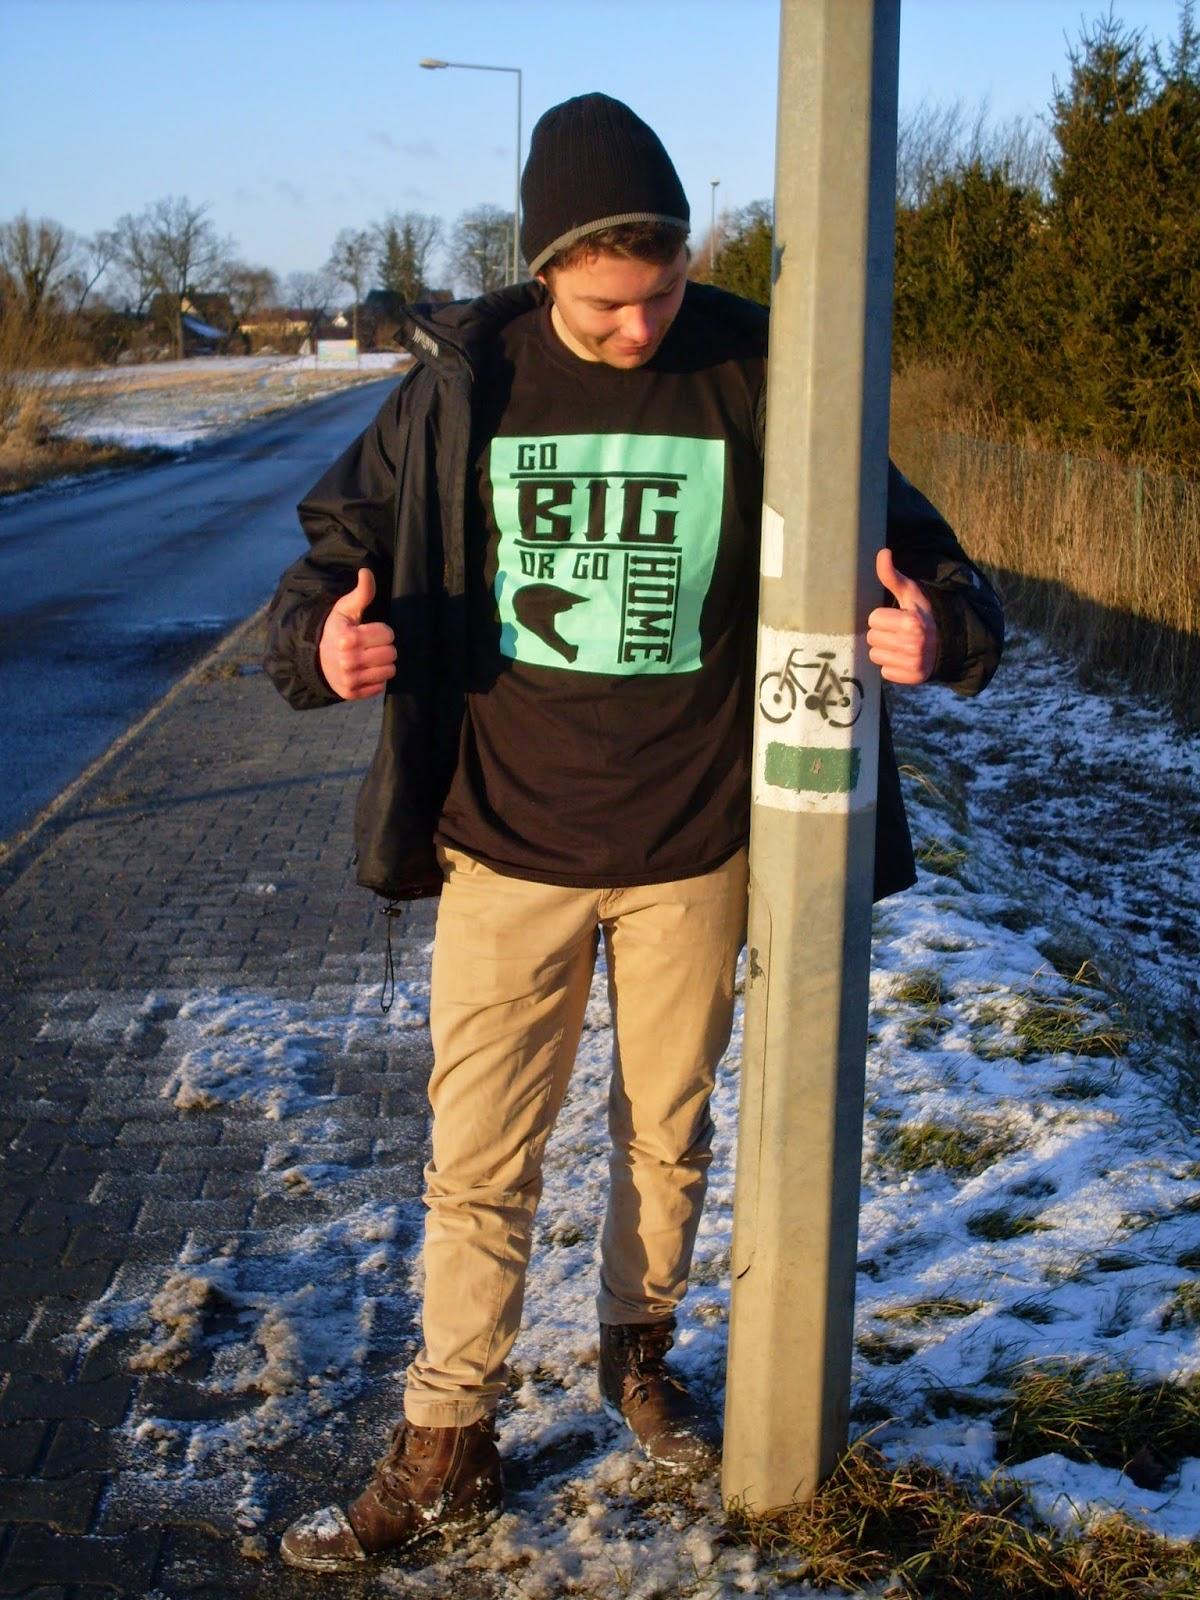 Koszulka Go big or go home